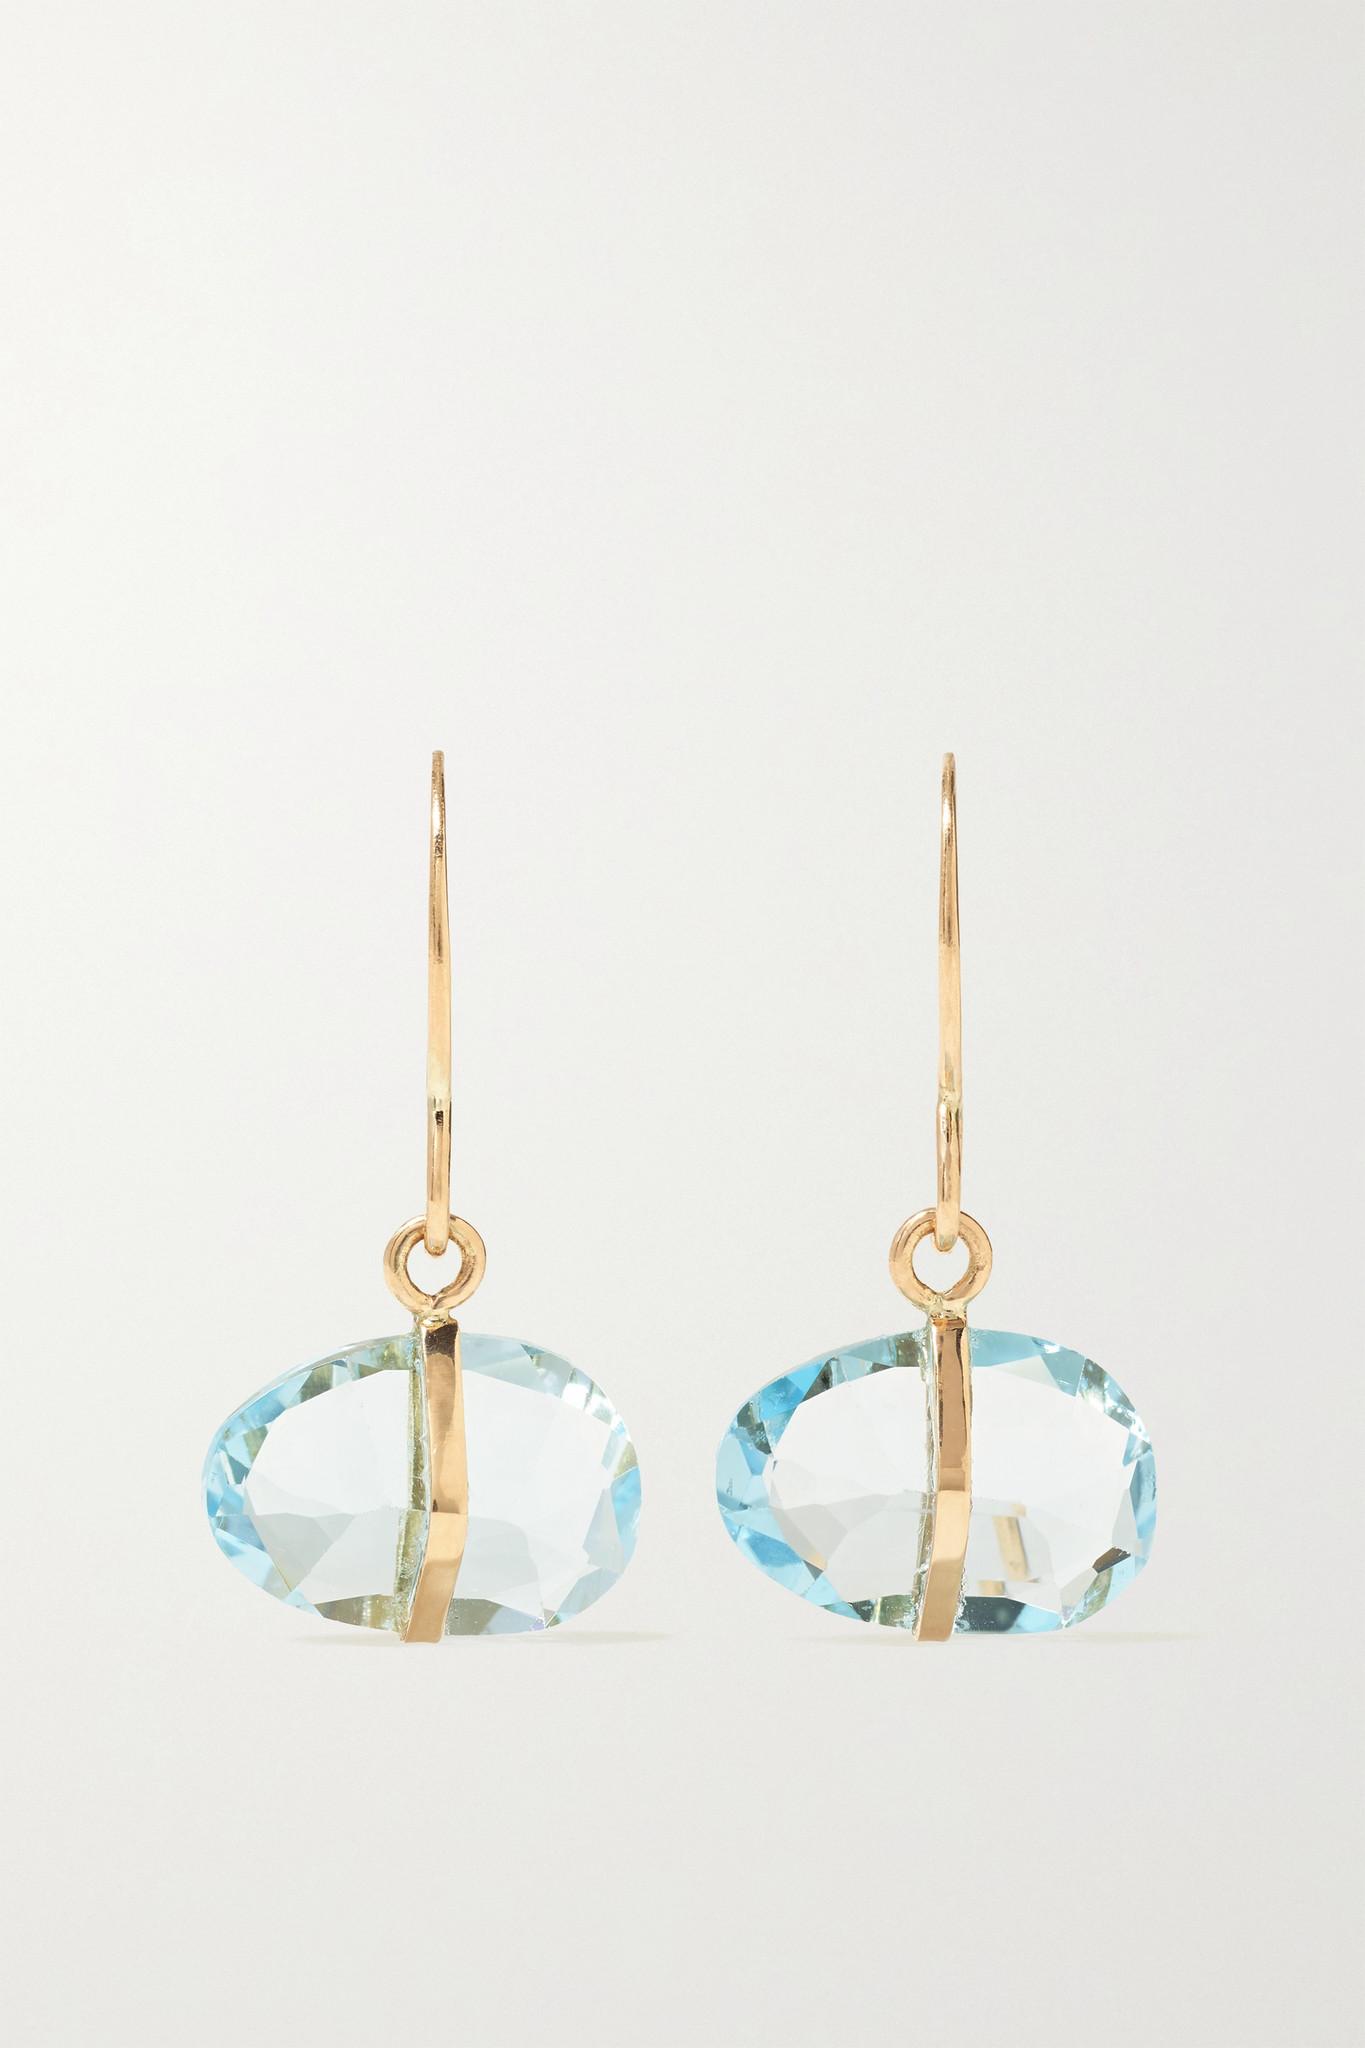 MELISSA JOY MANNING - 14k 回收黄金托帕石耳环 - 金色 - one size